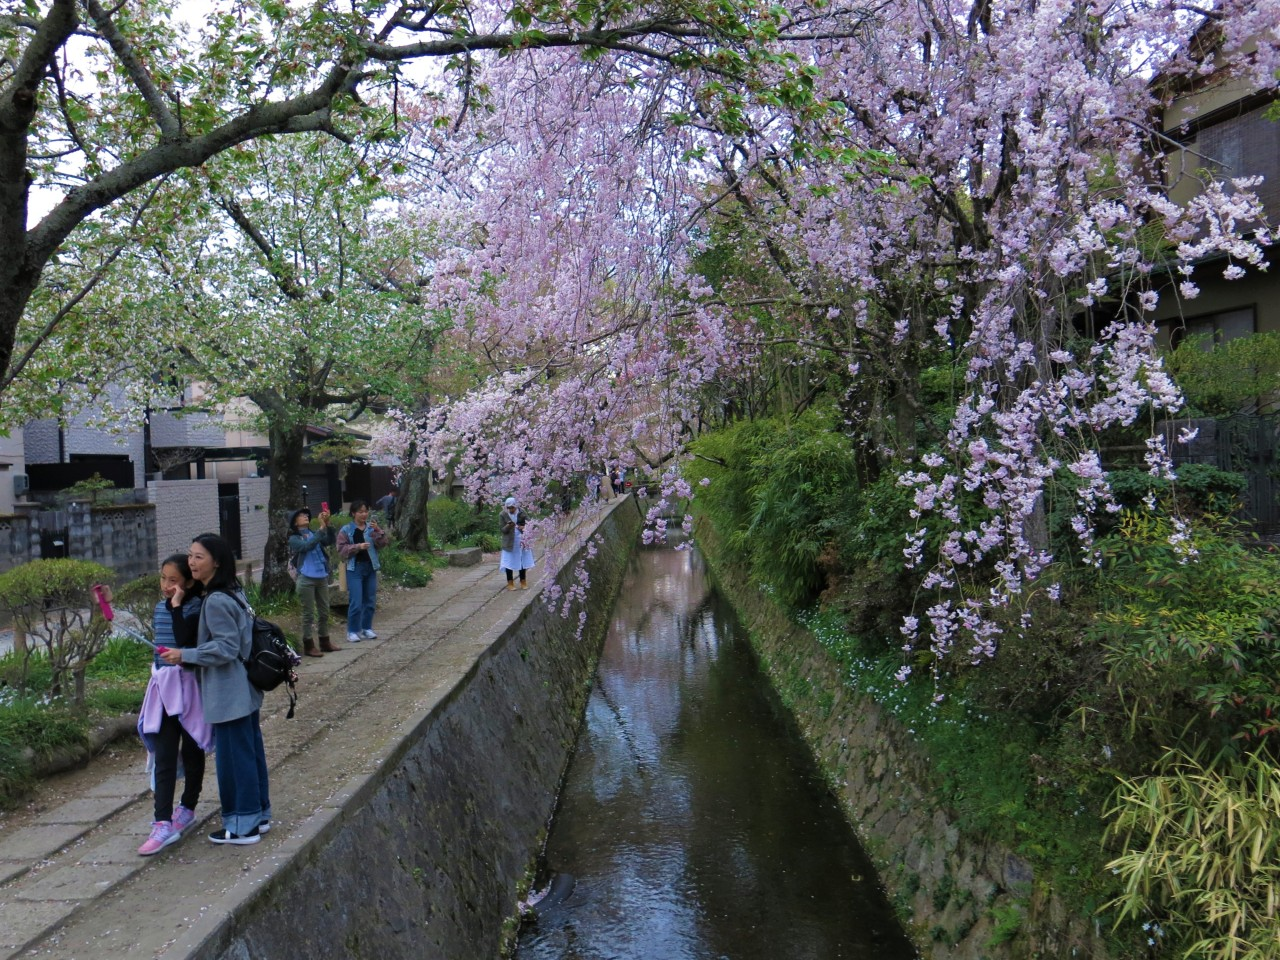 Kyoto! The Philosopher's Path, Fushimi Inari Temple and the GoldenPavillion